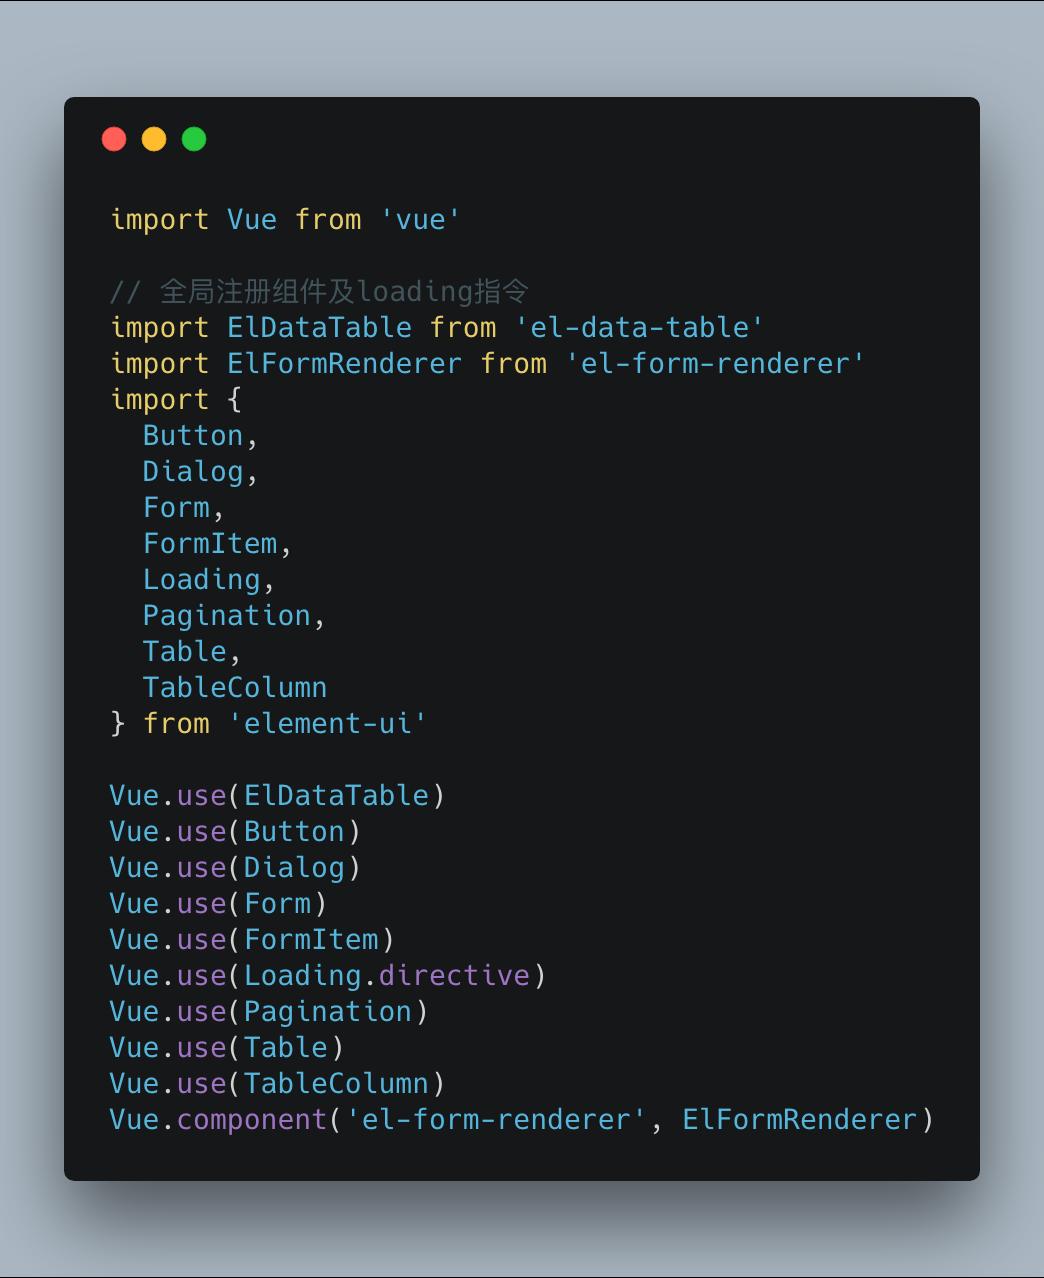 el-data-table, 让CRUD更简单👏